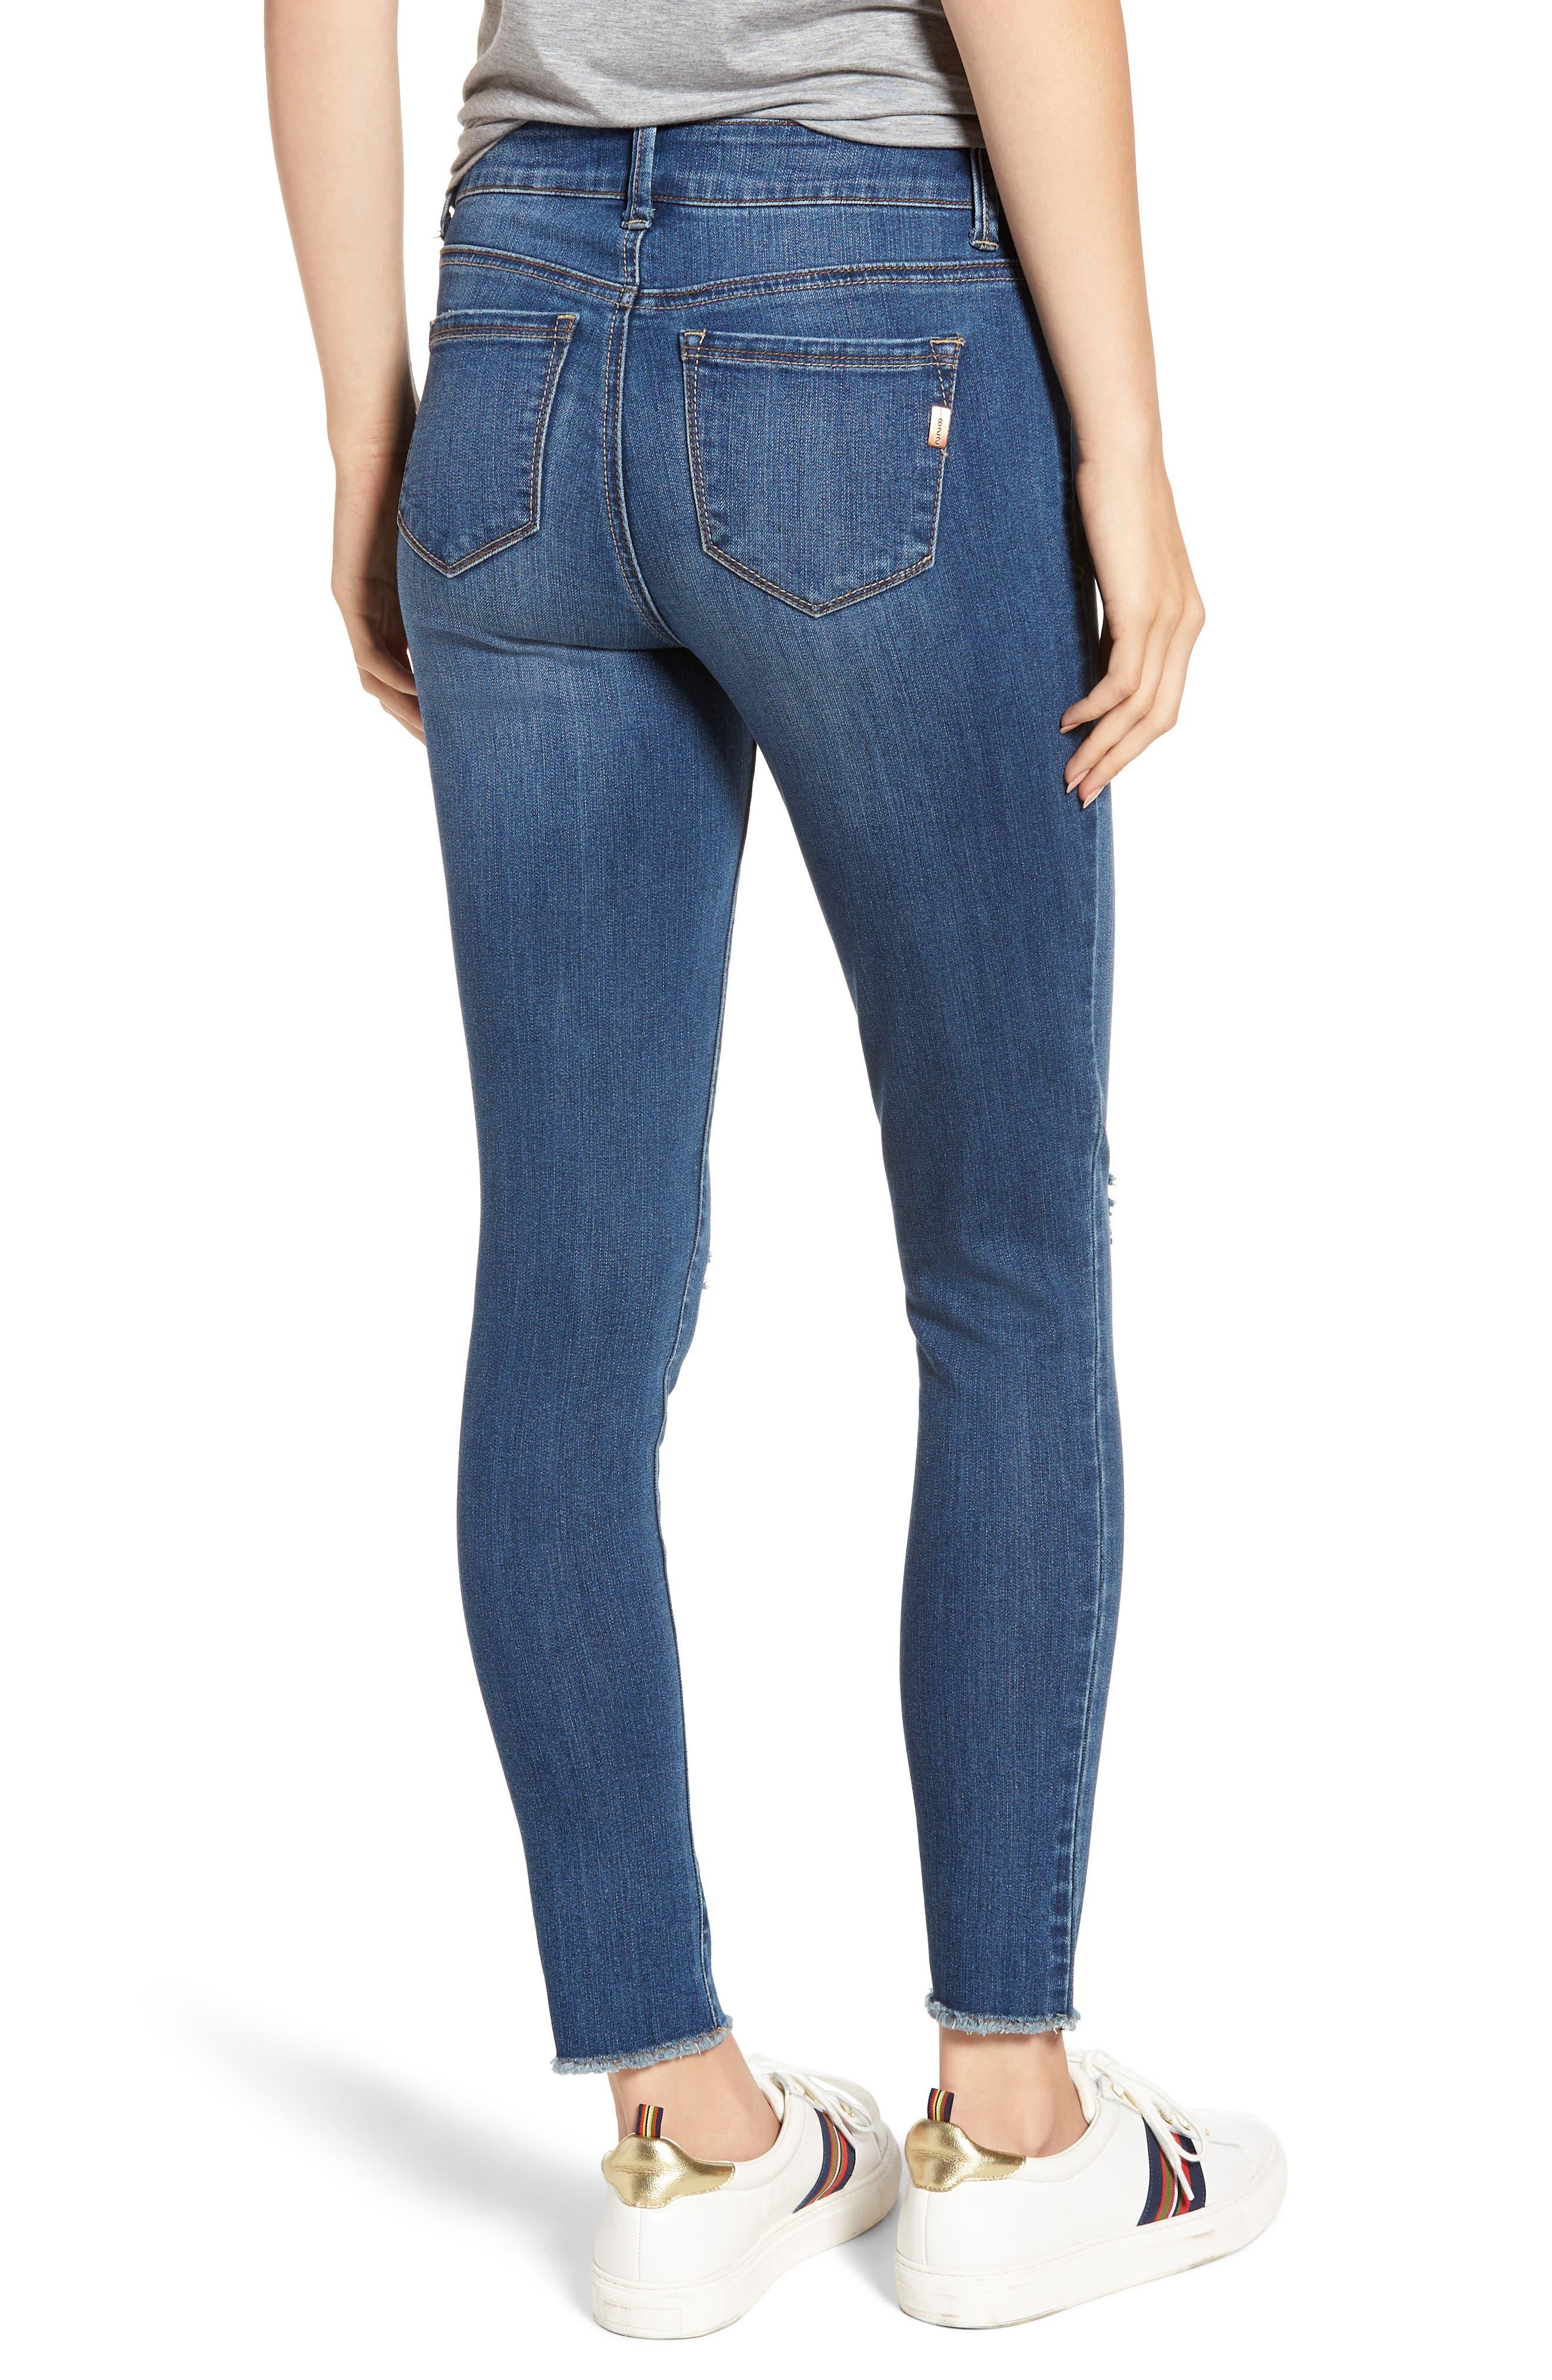 1822 DENIM,                             Distressed Skinny Jeans,                             Alternate thumbnail 2, color,                             CHRISTINA